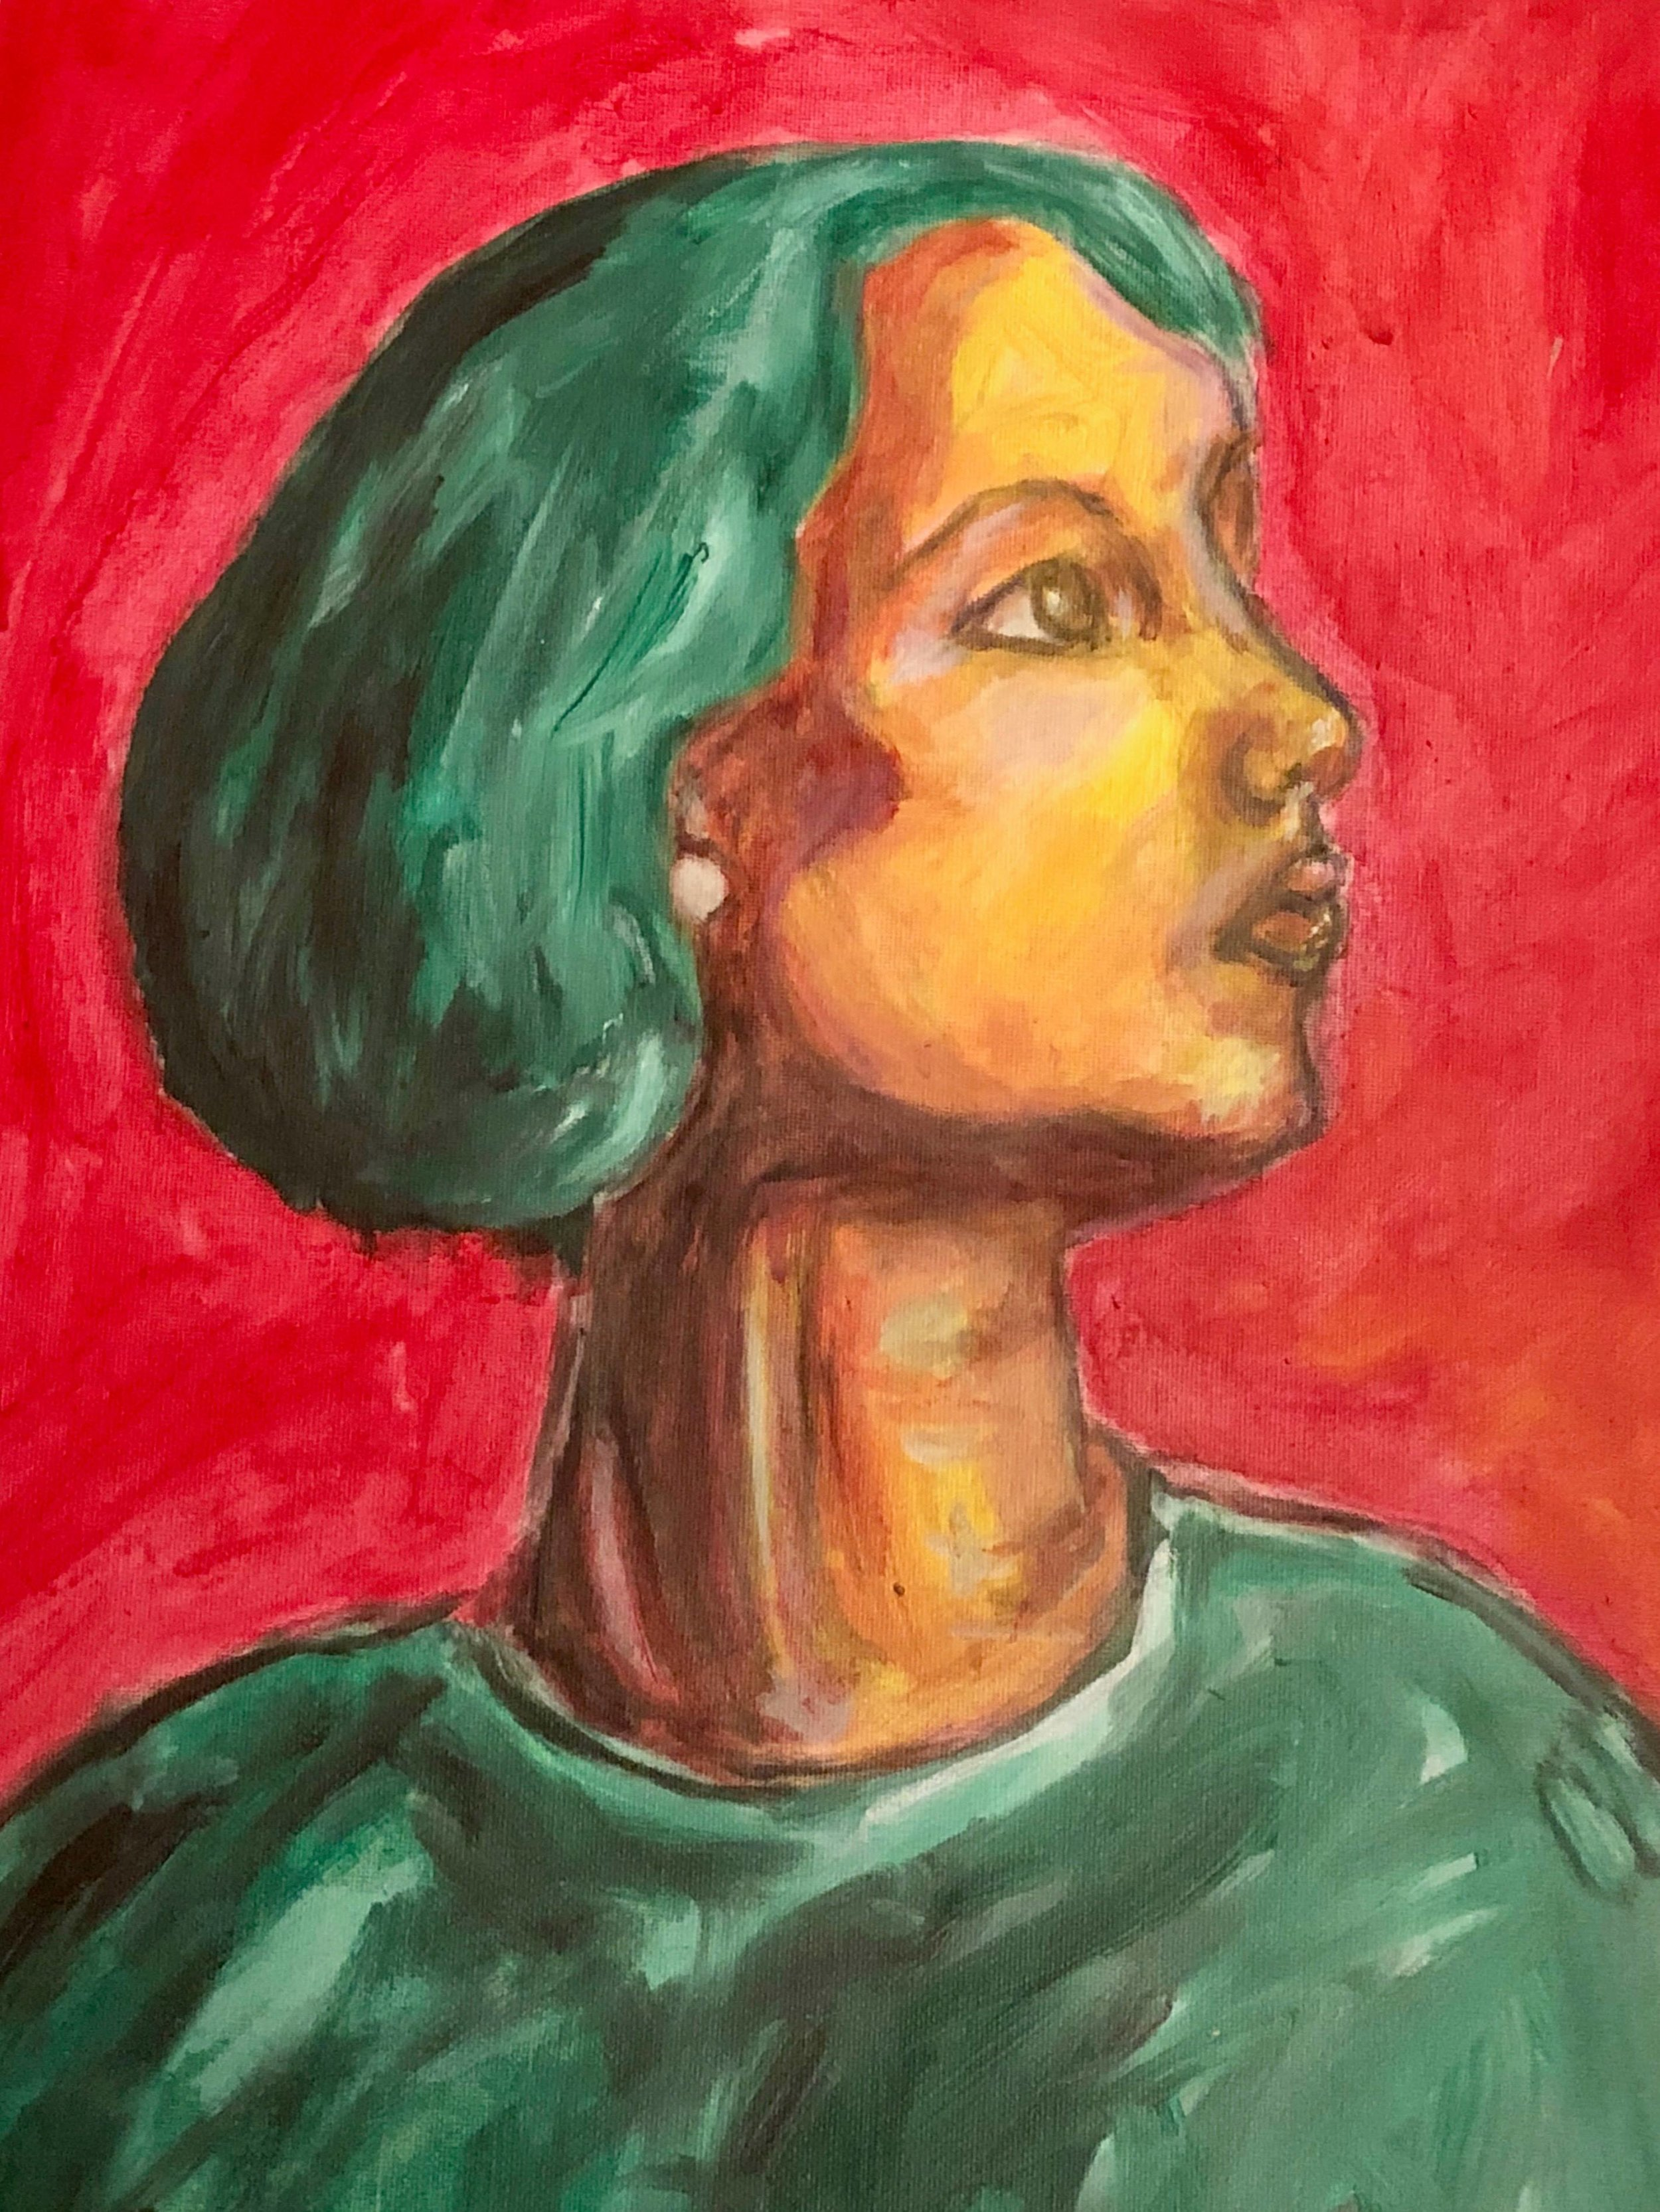 Portrait of me by Richard Greene